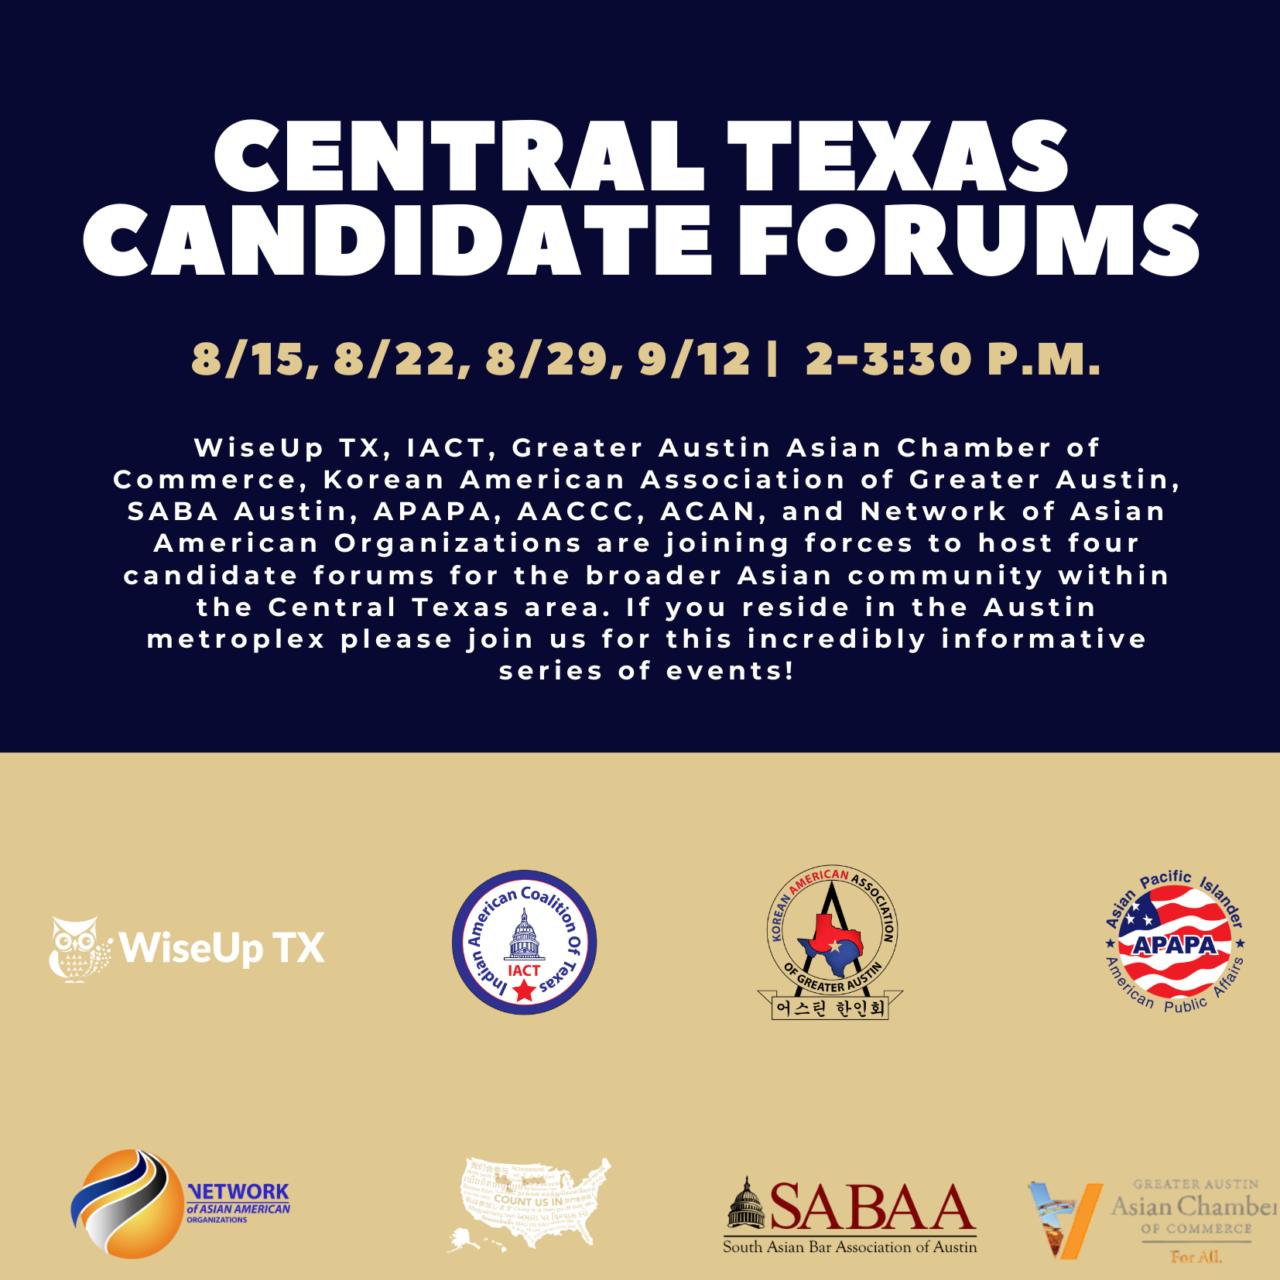 https://www.wiseuptx.org/wp-content/uploads/2020/08/Candidate-Forum-Webinars-1280x1280.png